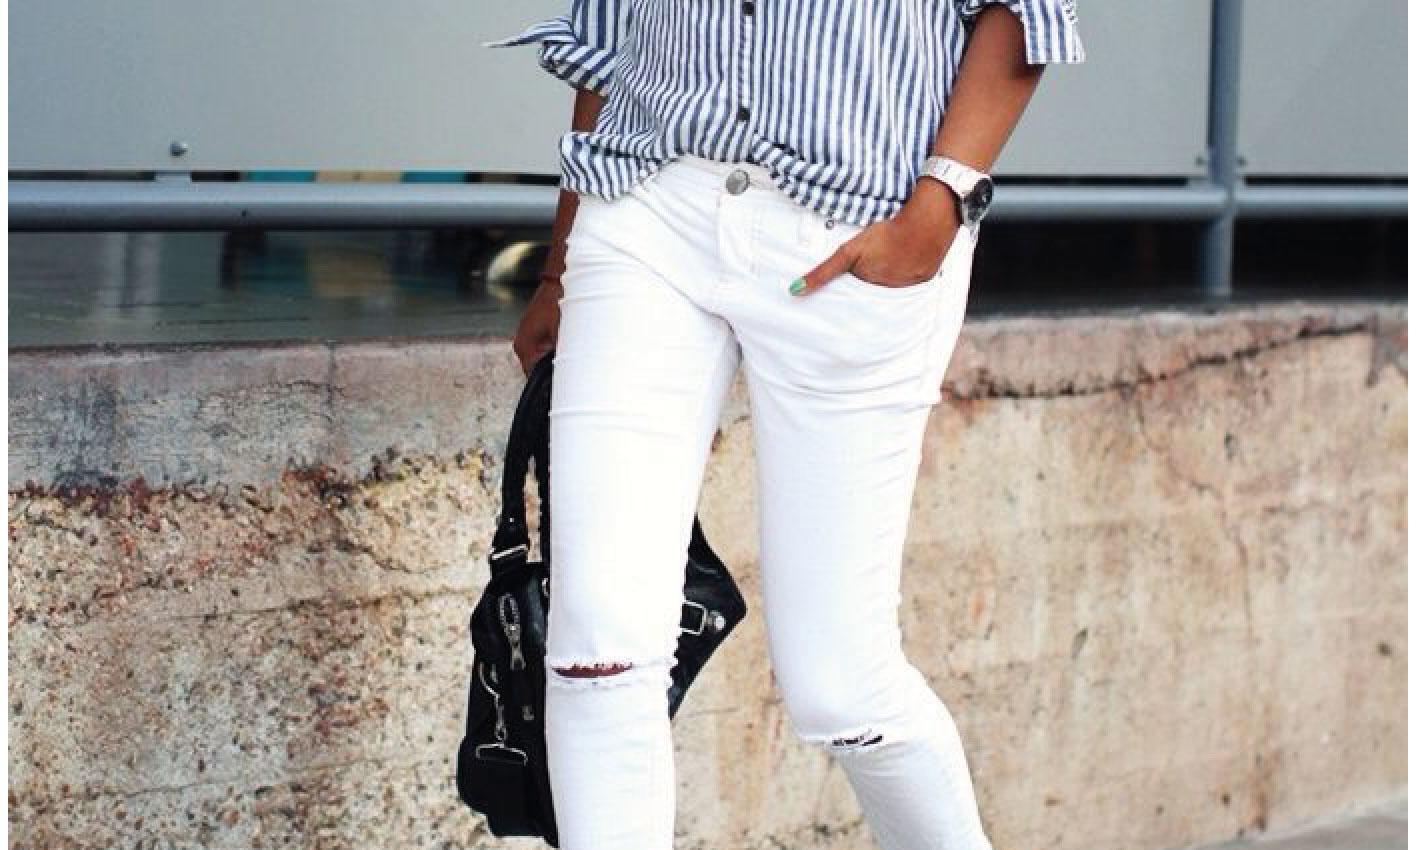 Witte jeans, zó draag je hem zonder problemen